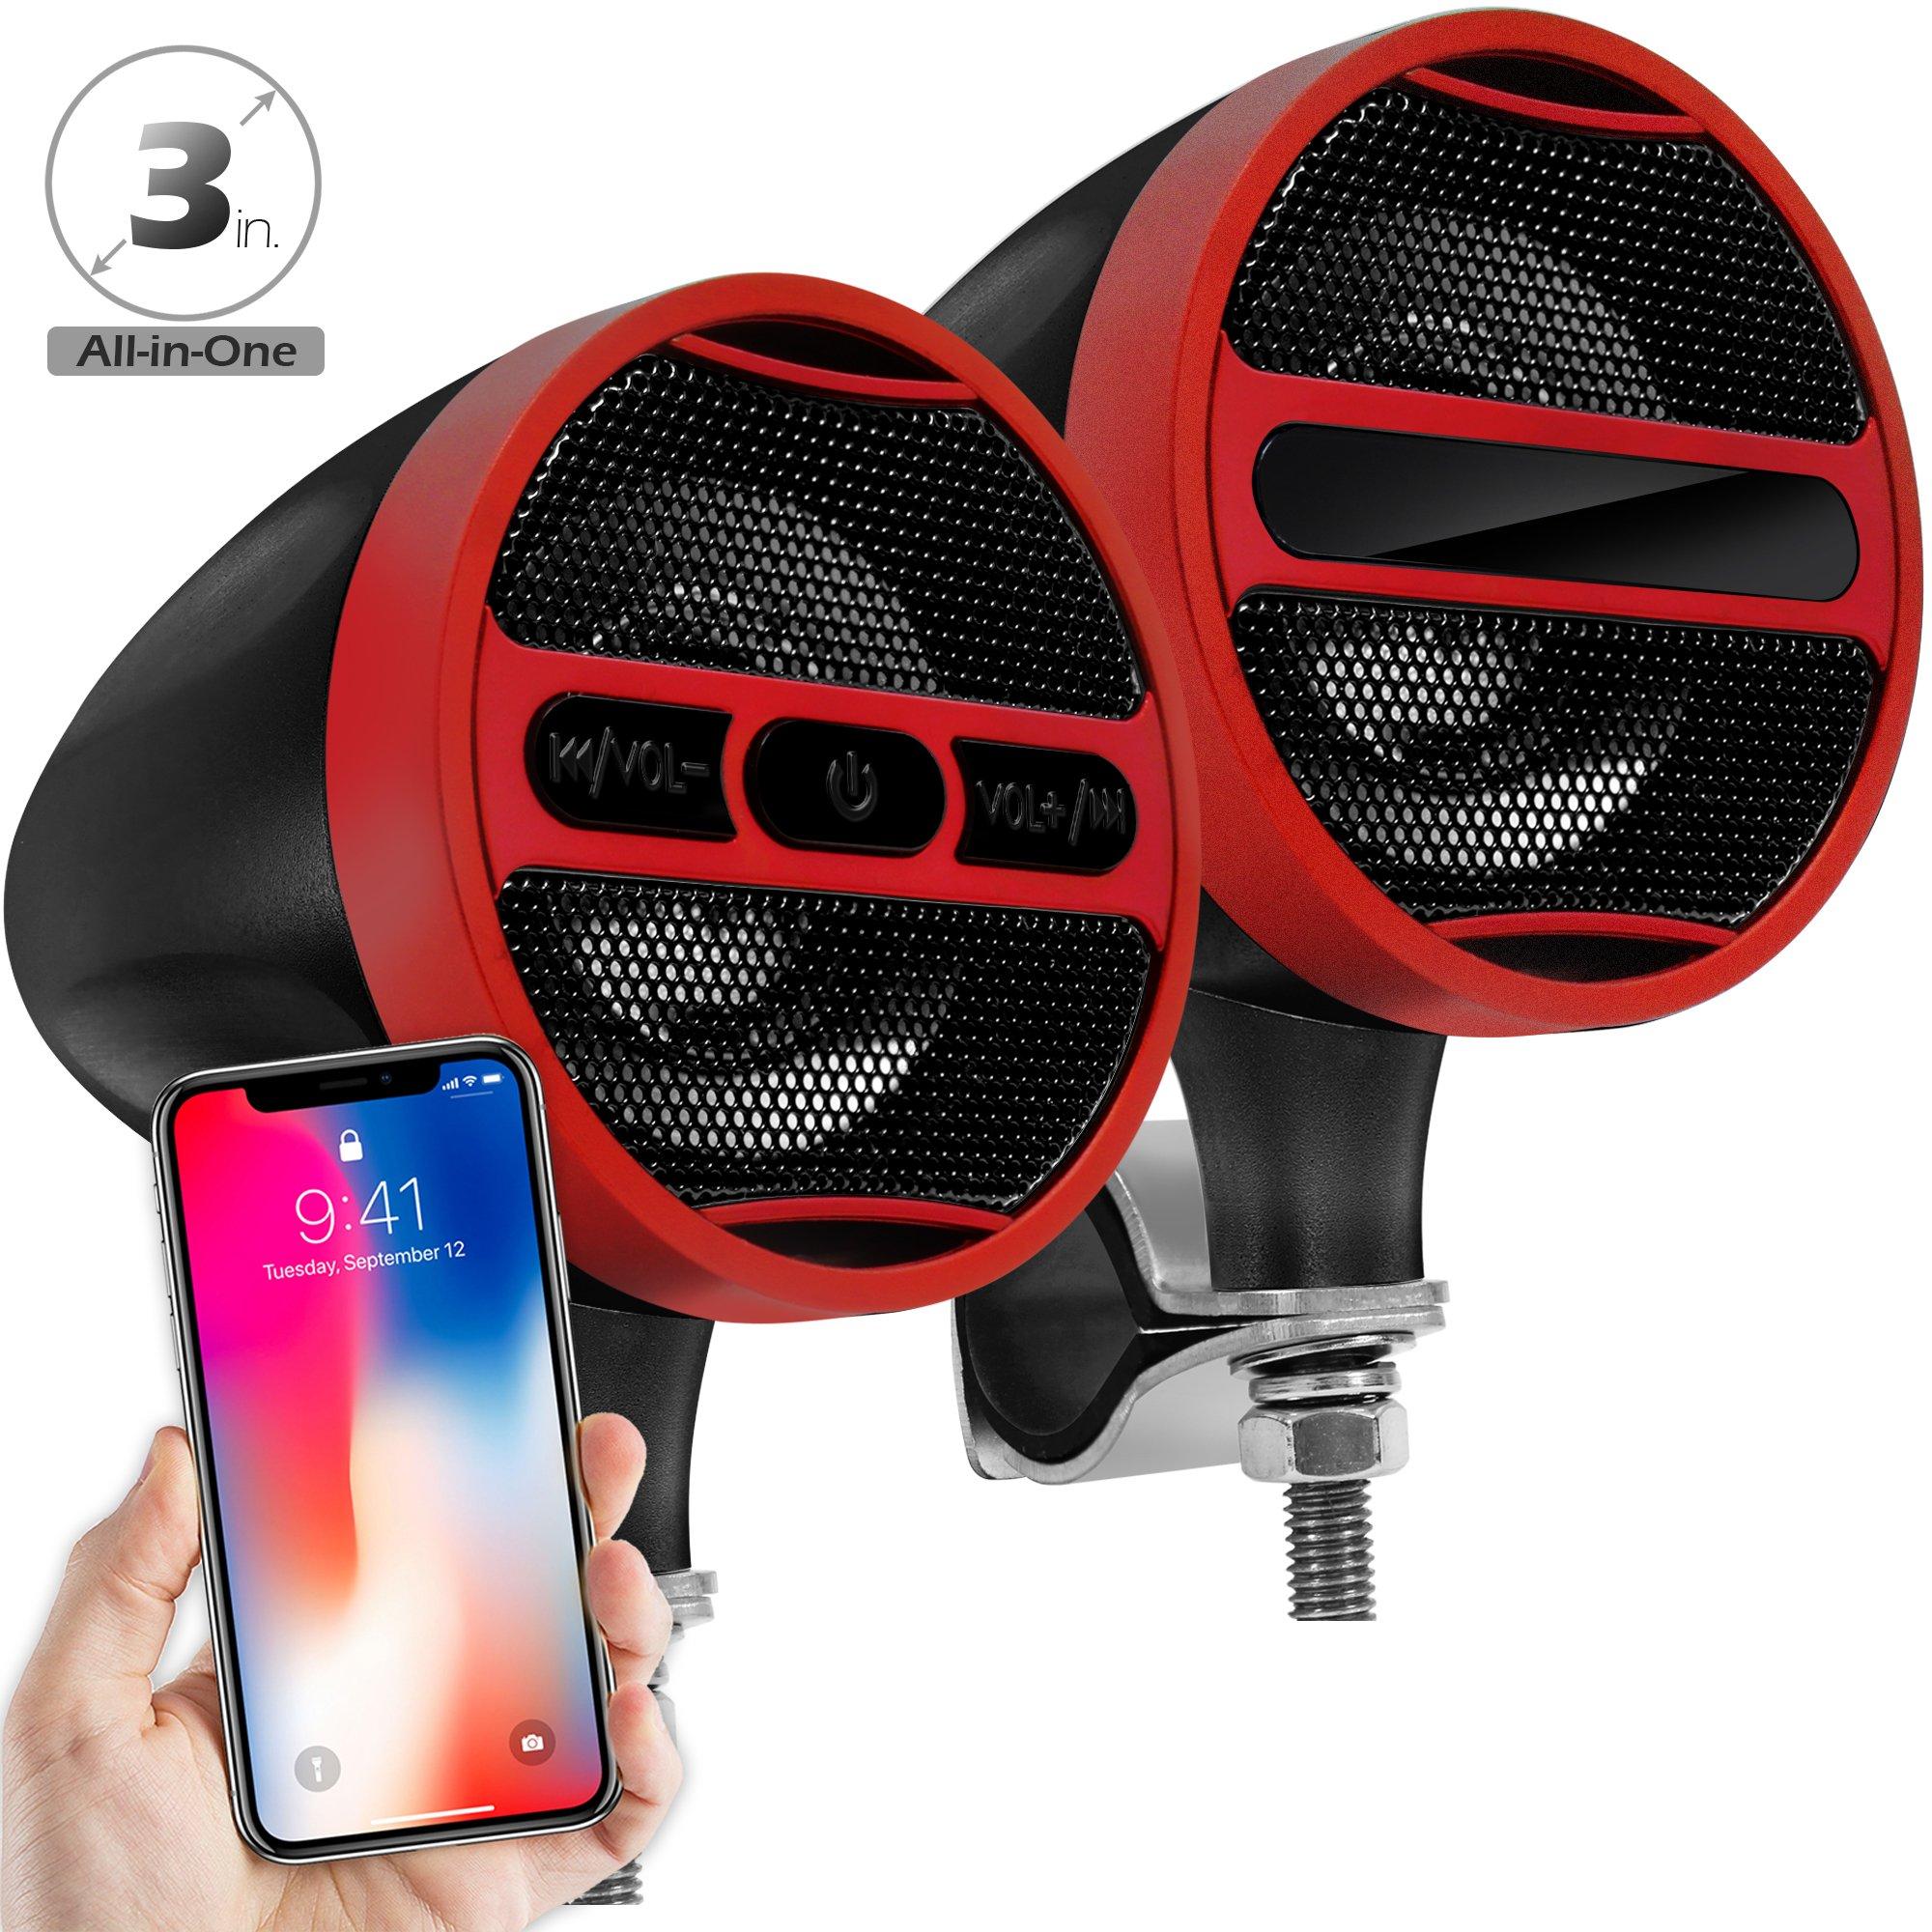 GoldenHawk Waterproof Bluetooth Wireless Motorcycle Stereo Speakers 7/8-1.25 in. Handlebar Mount MP3 Music Player Audio Amplifier System Scooter Bike ATV UTV, USB, FM Radio (Satin Red Black)